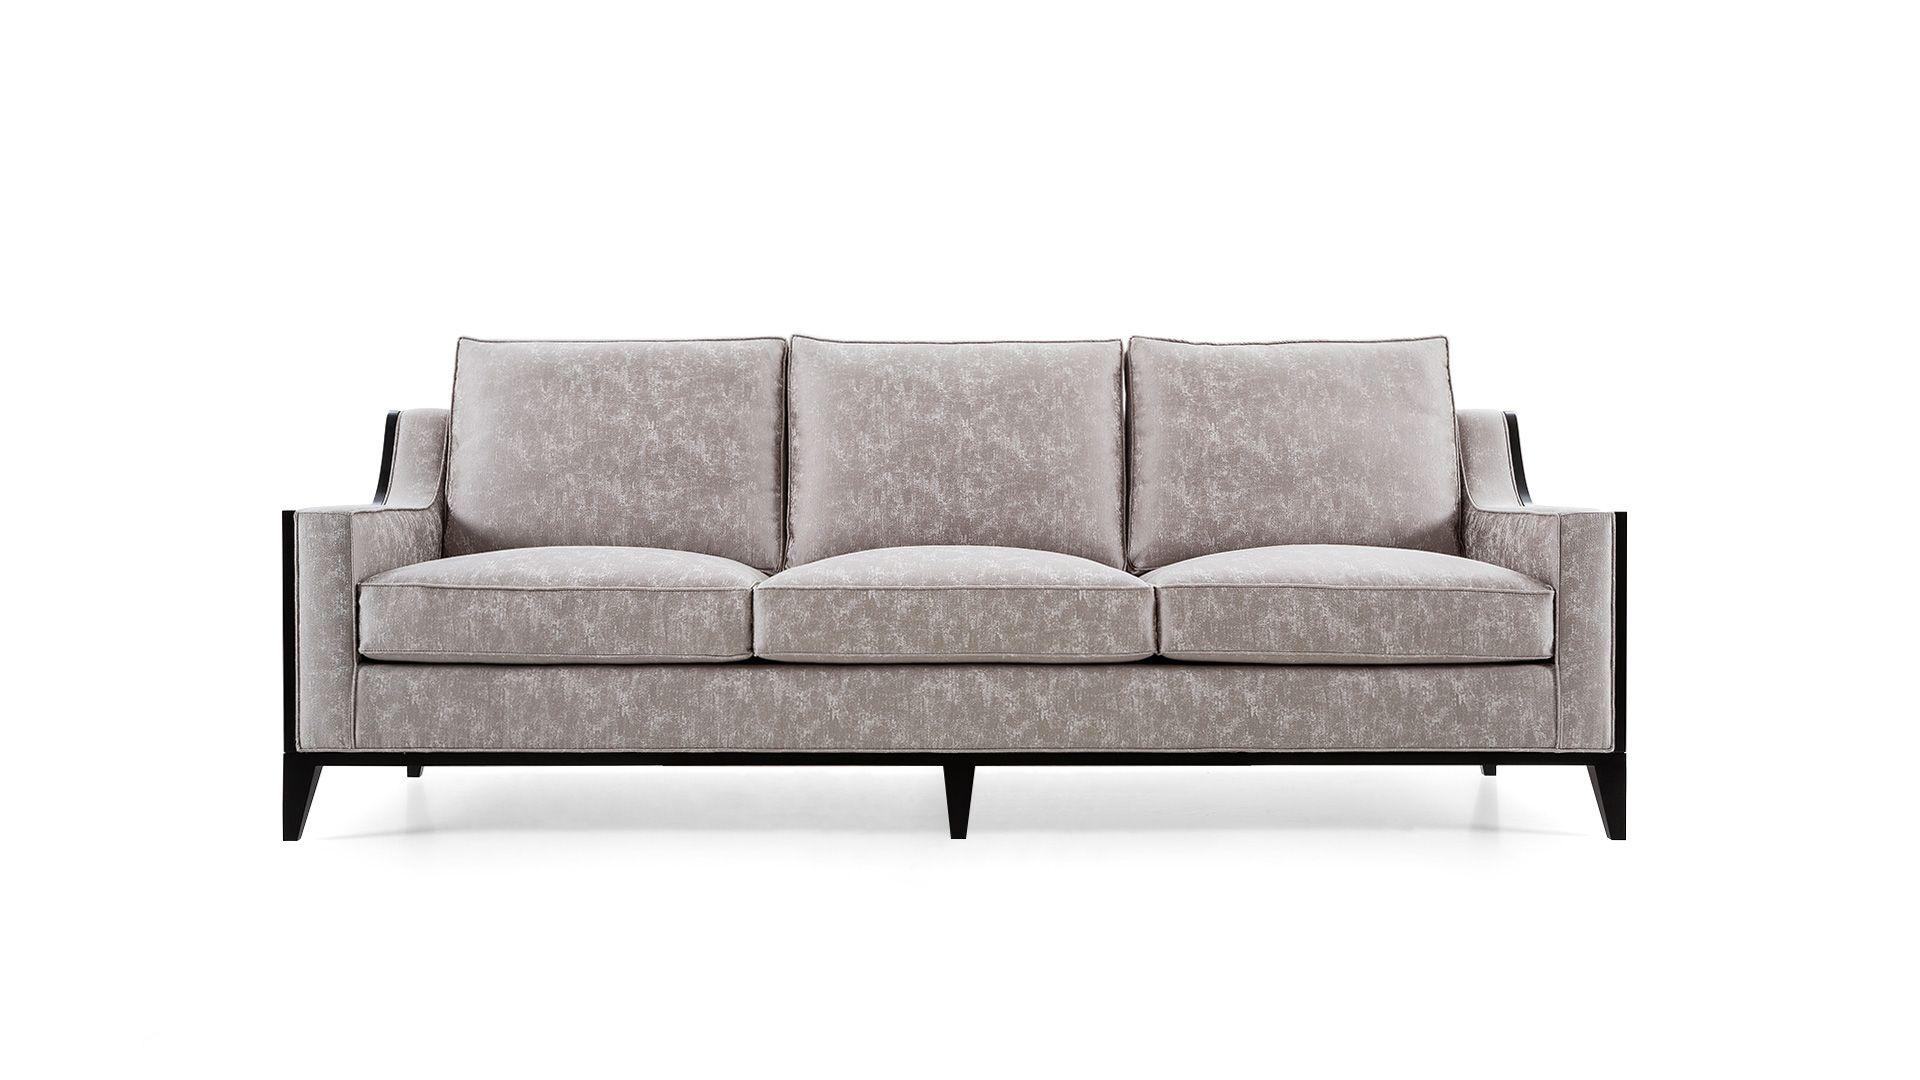 Claridges U2013 Bespoke Sofa London